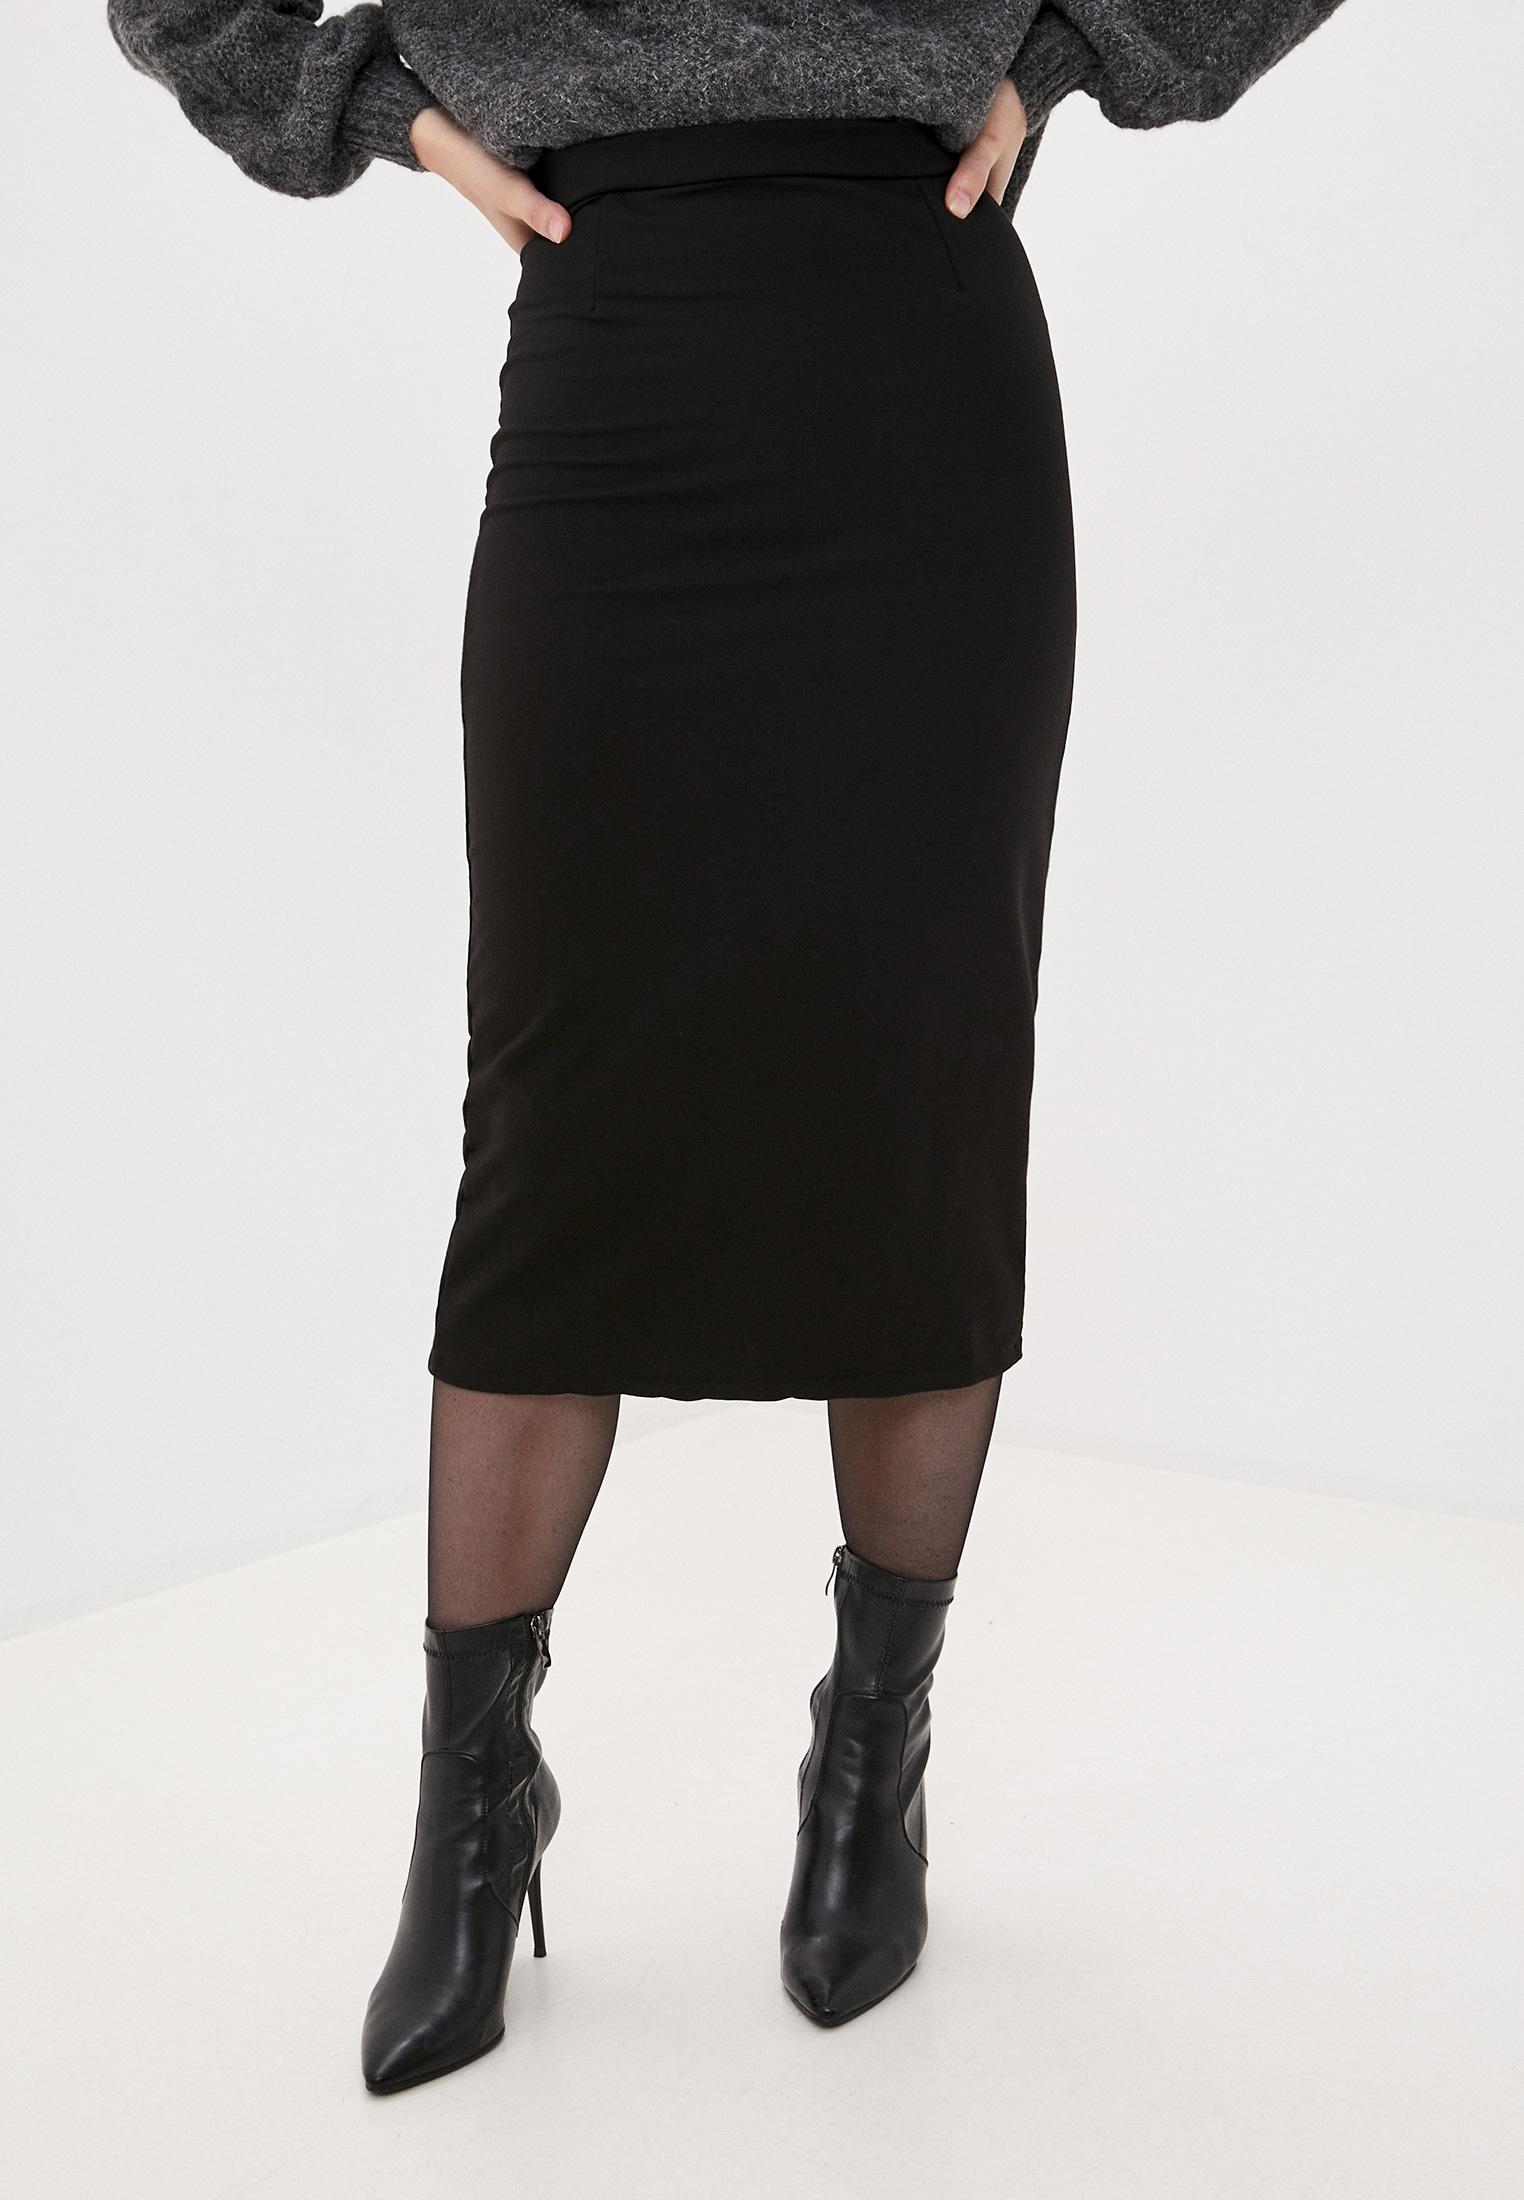 Узкая юбка Winzor Ю102